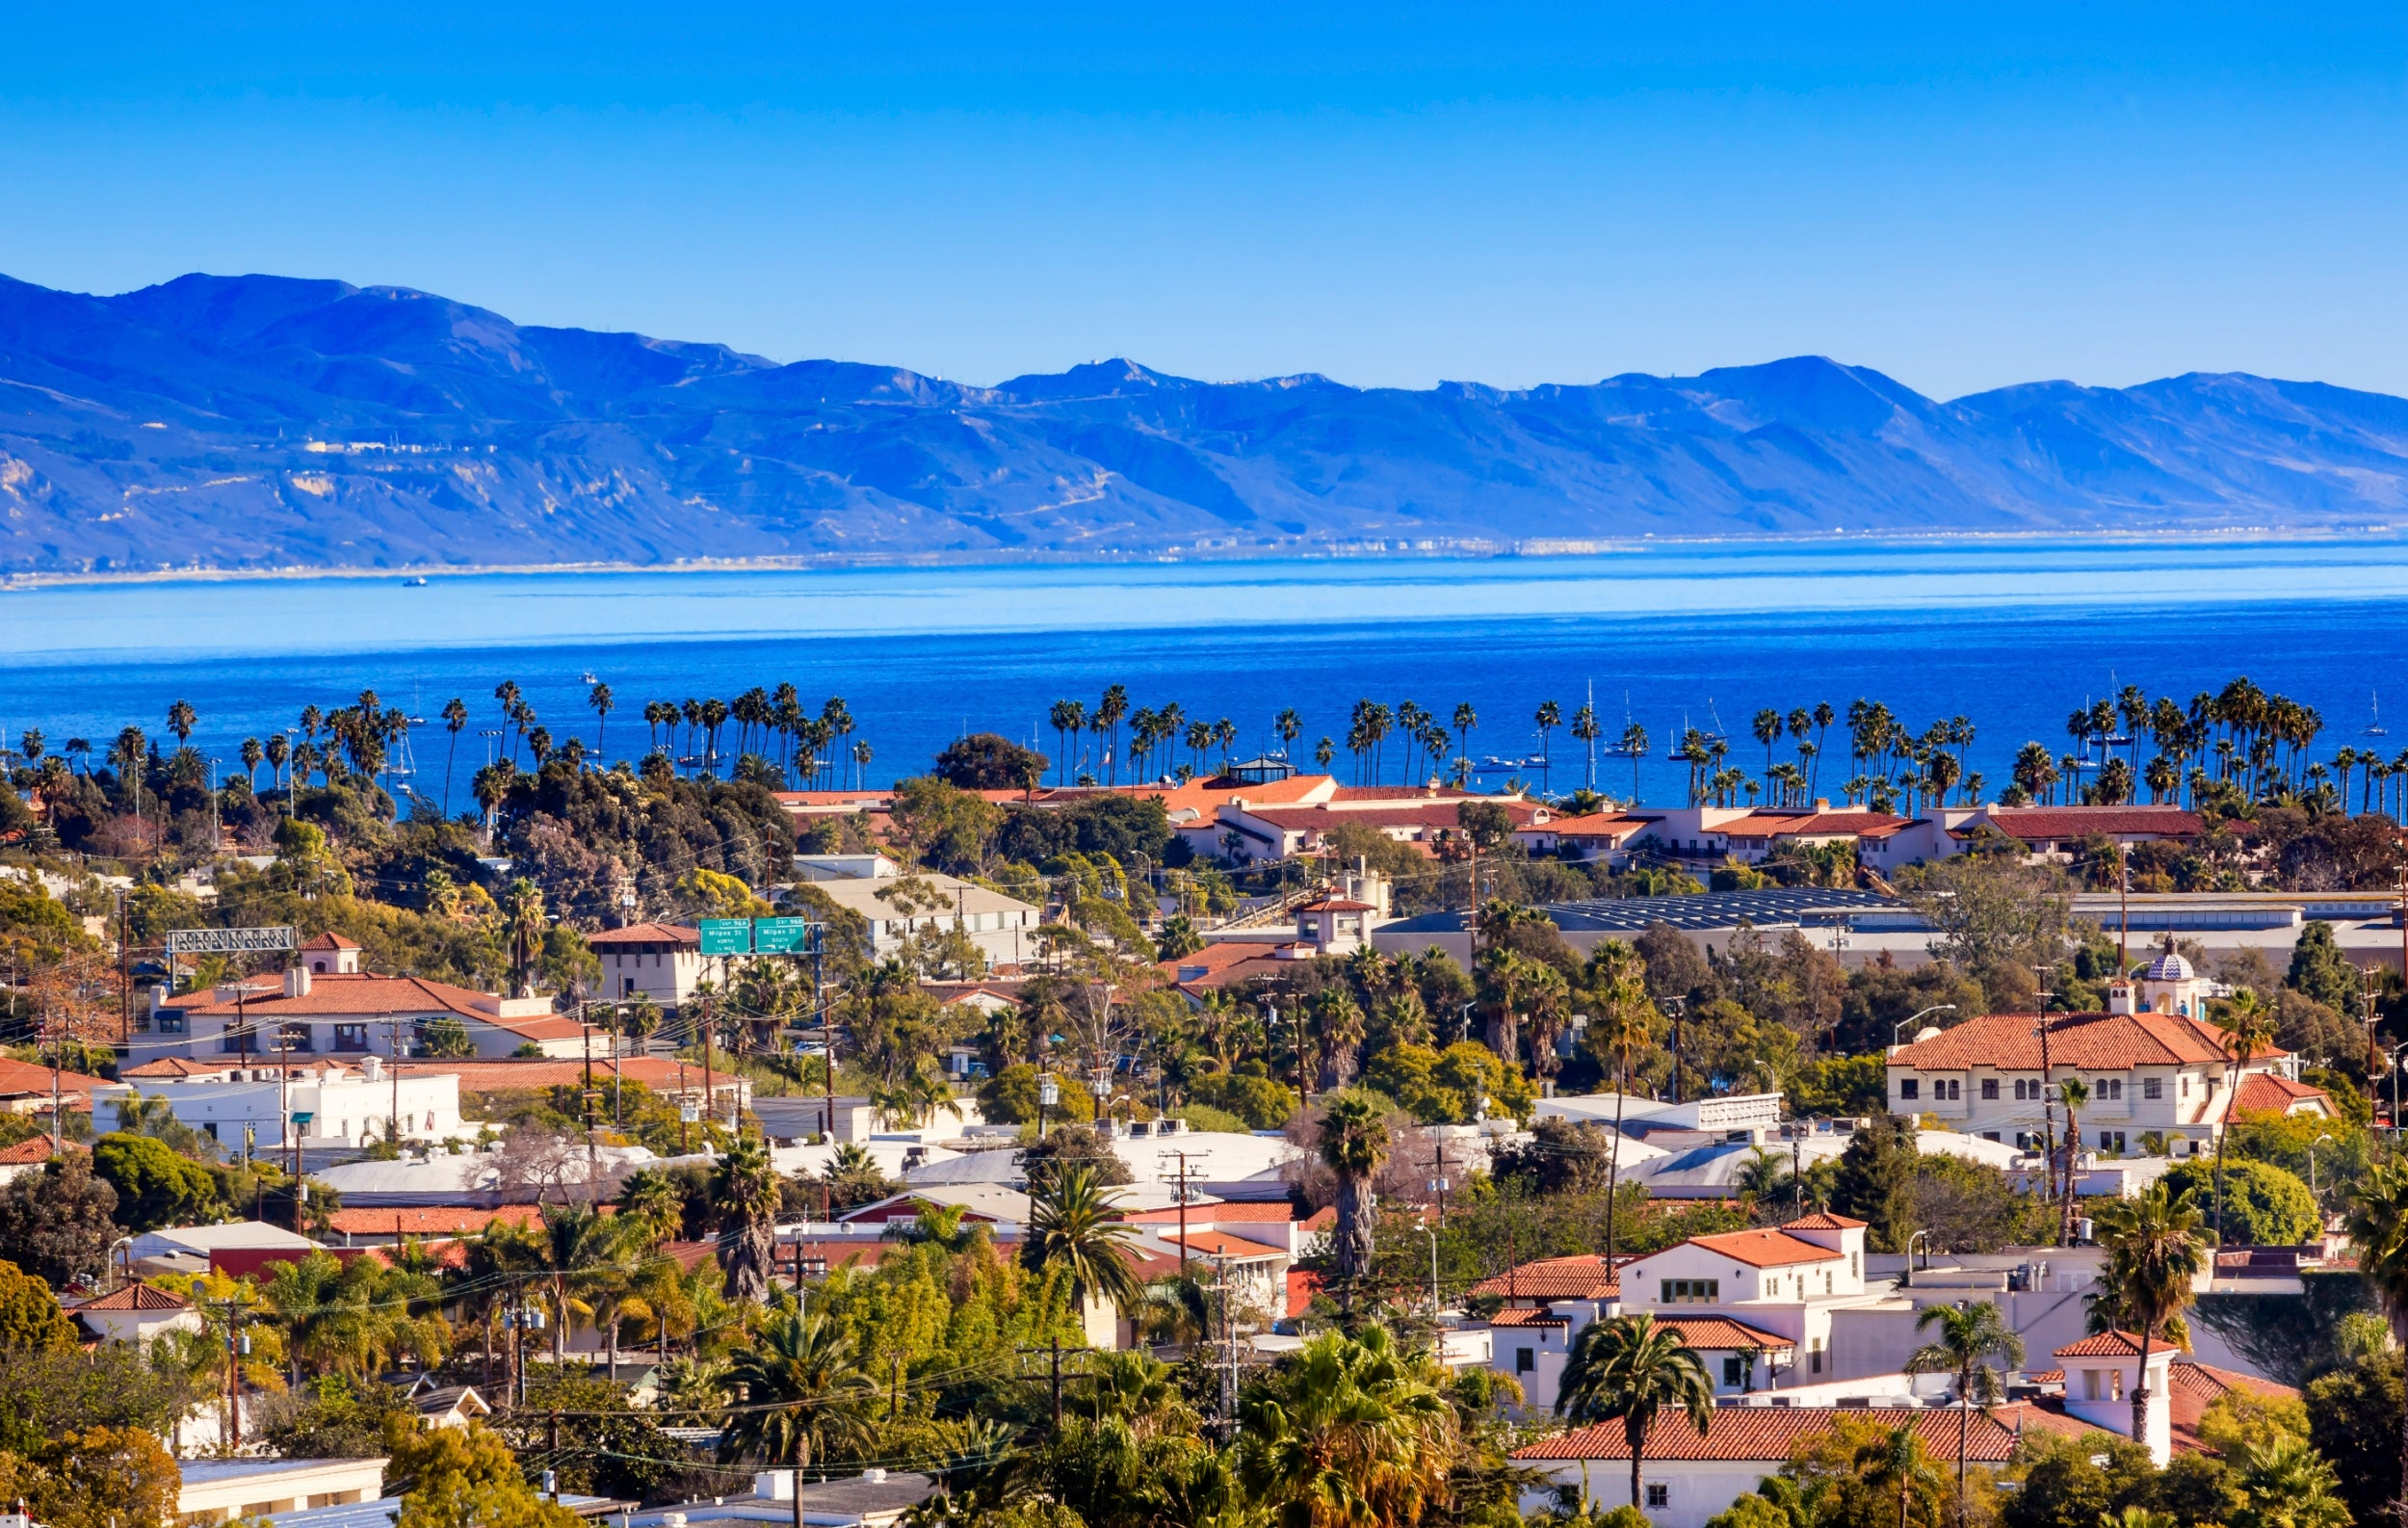 Santa Barbara, California: The 'American Riviera' becomes a hip food and wine haven